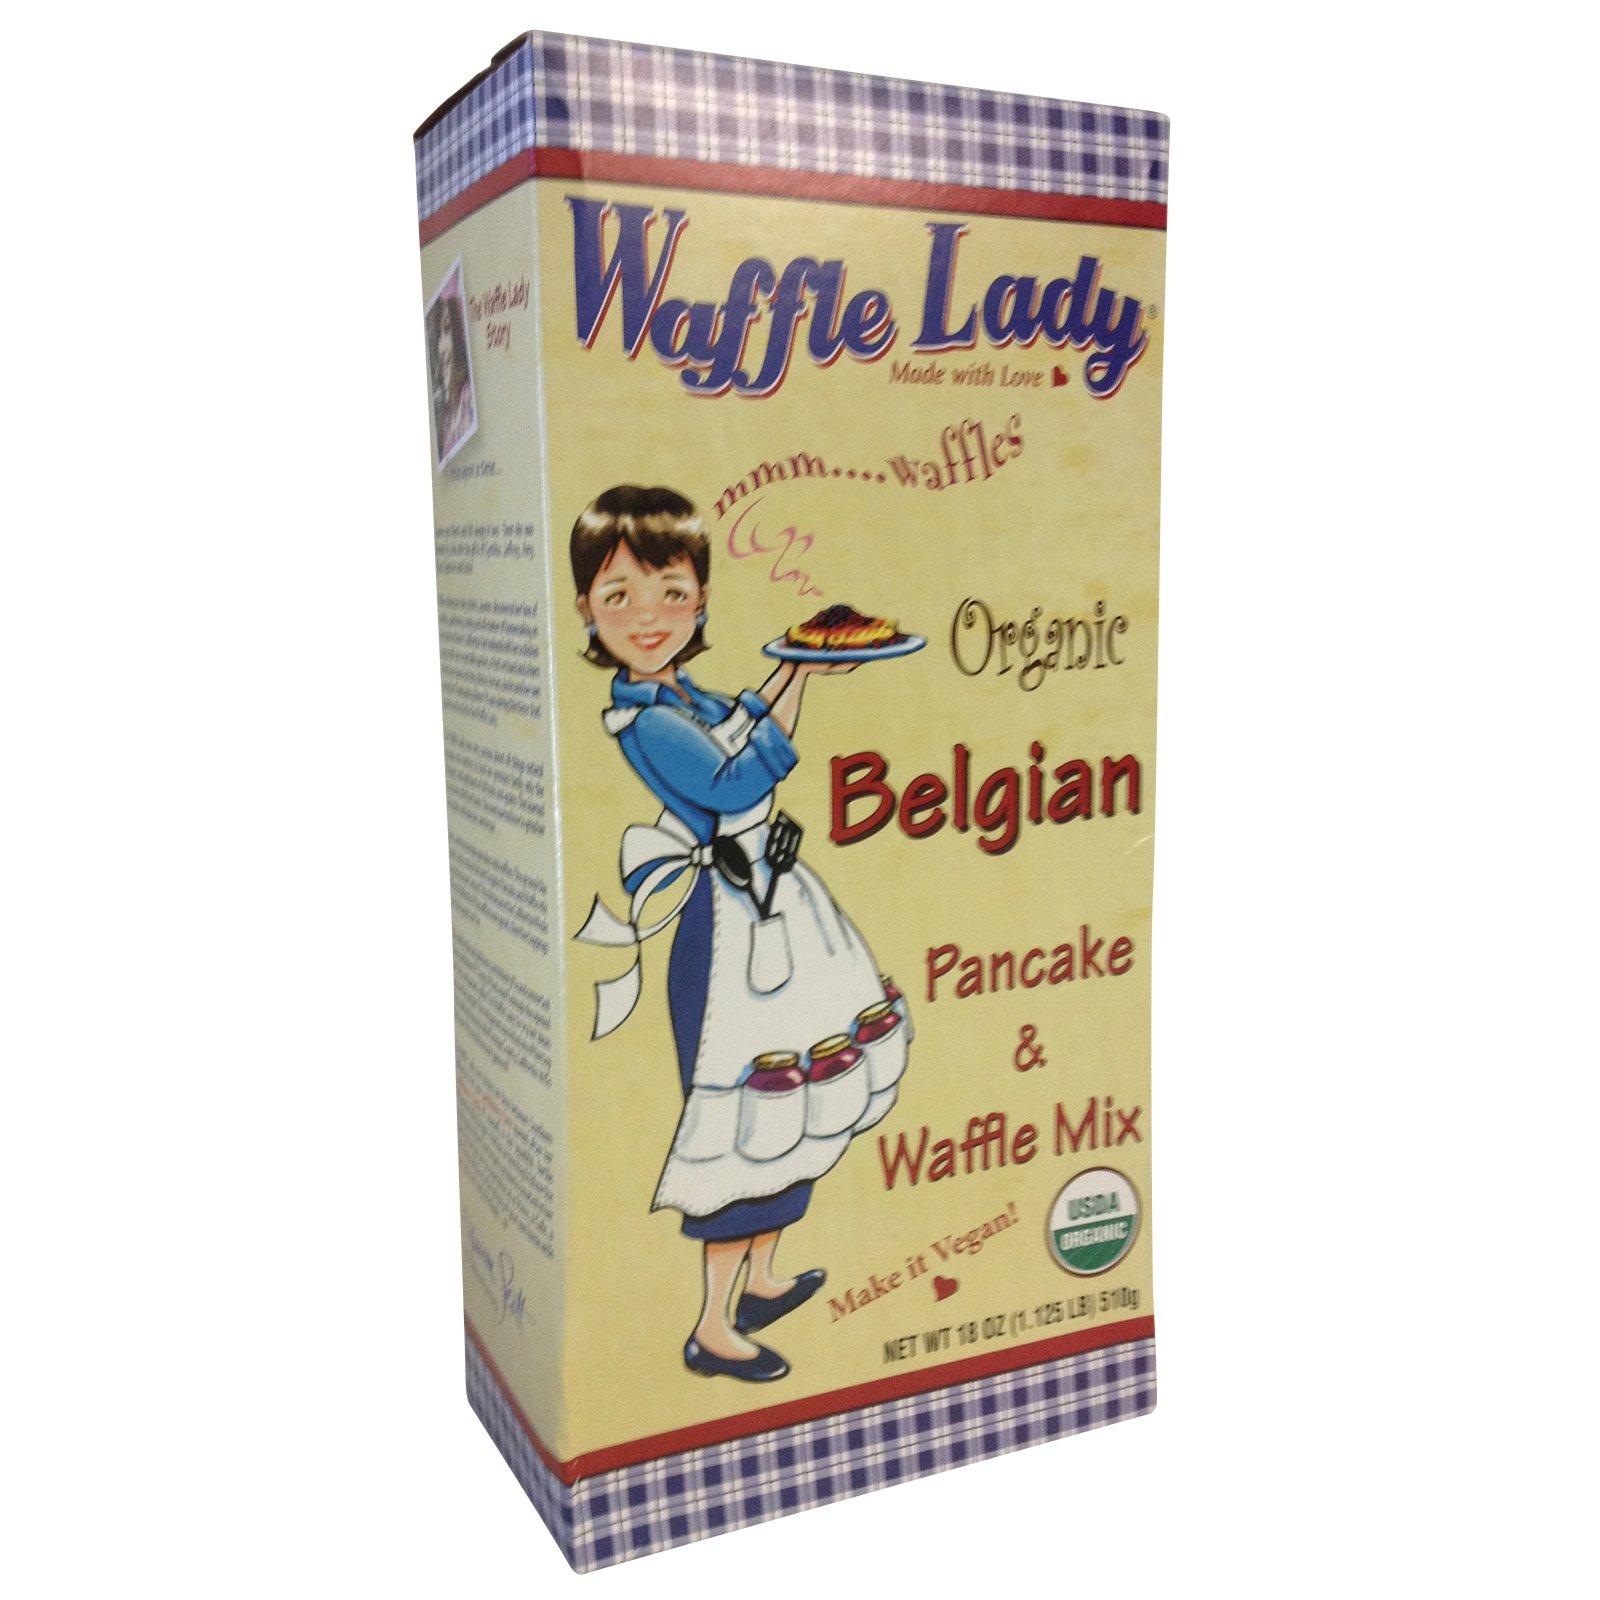 Waffle Lady Organic Belgian Buttermilk Pancake & Waffle Mix 18 Oz. Package